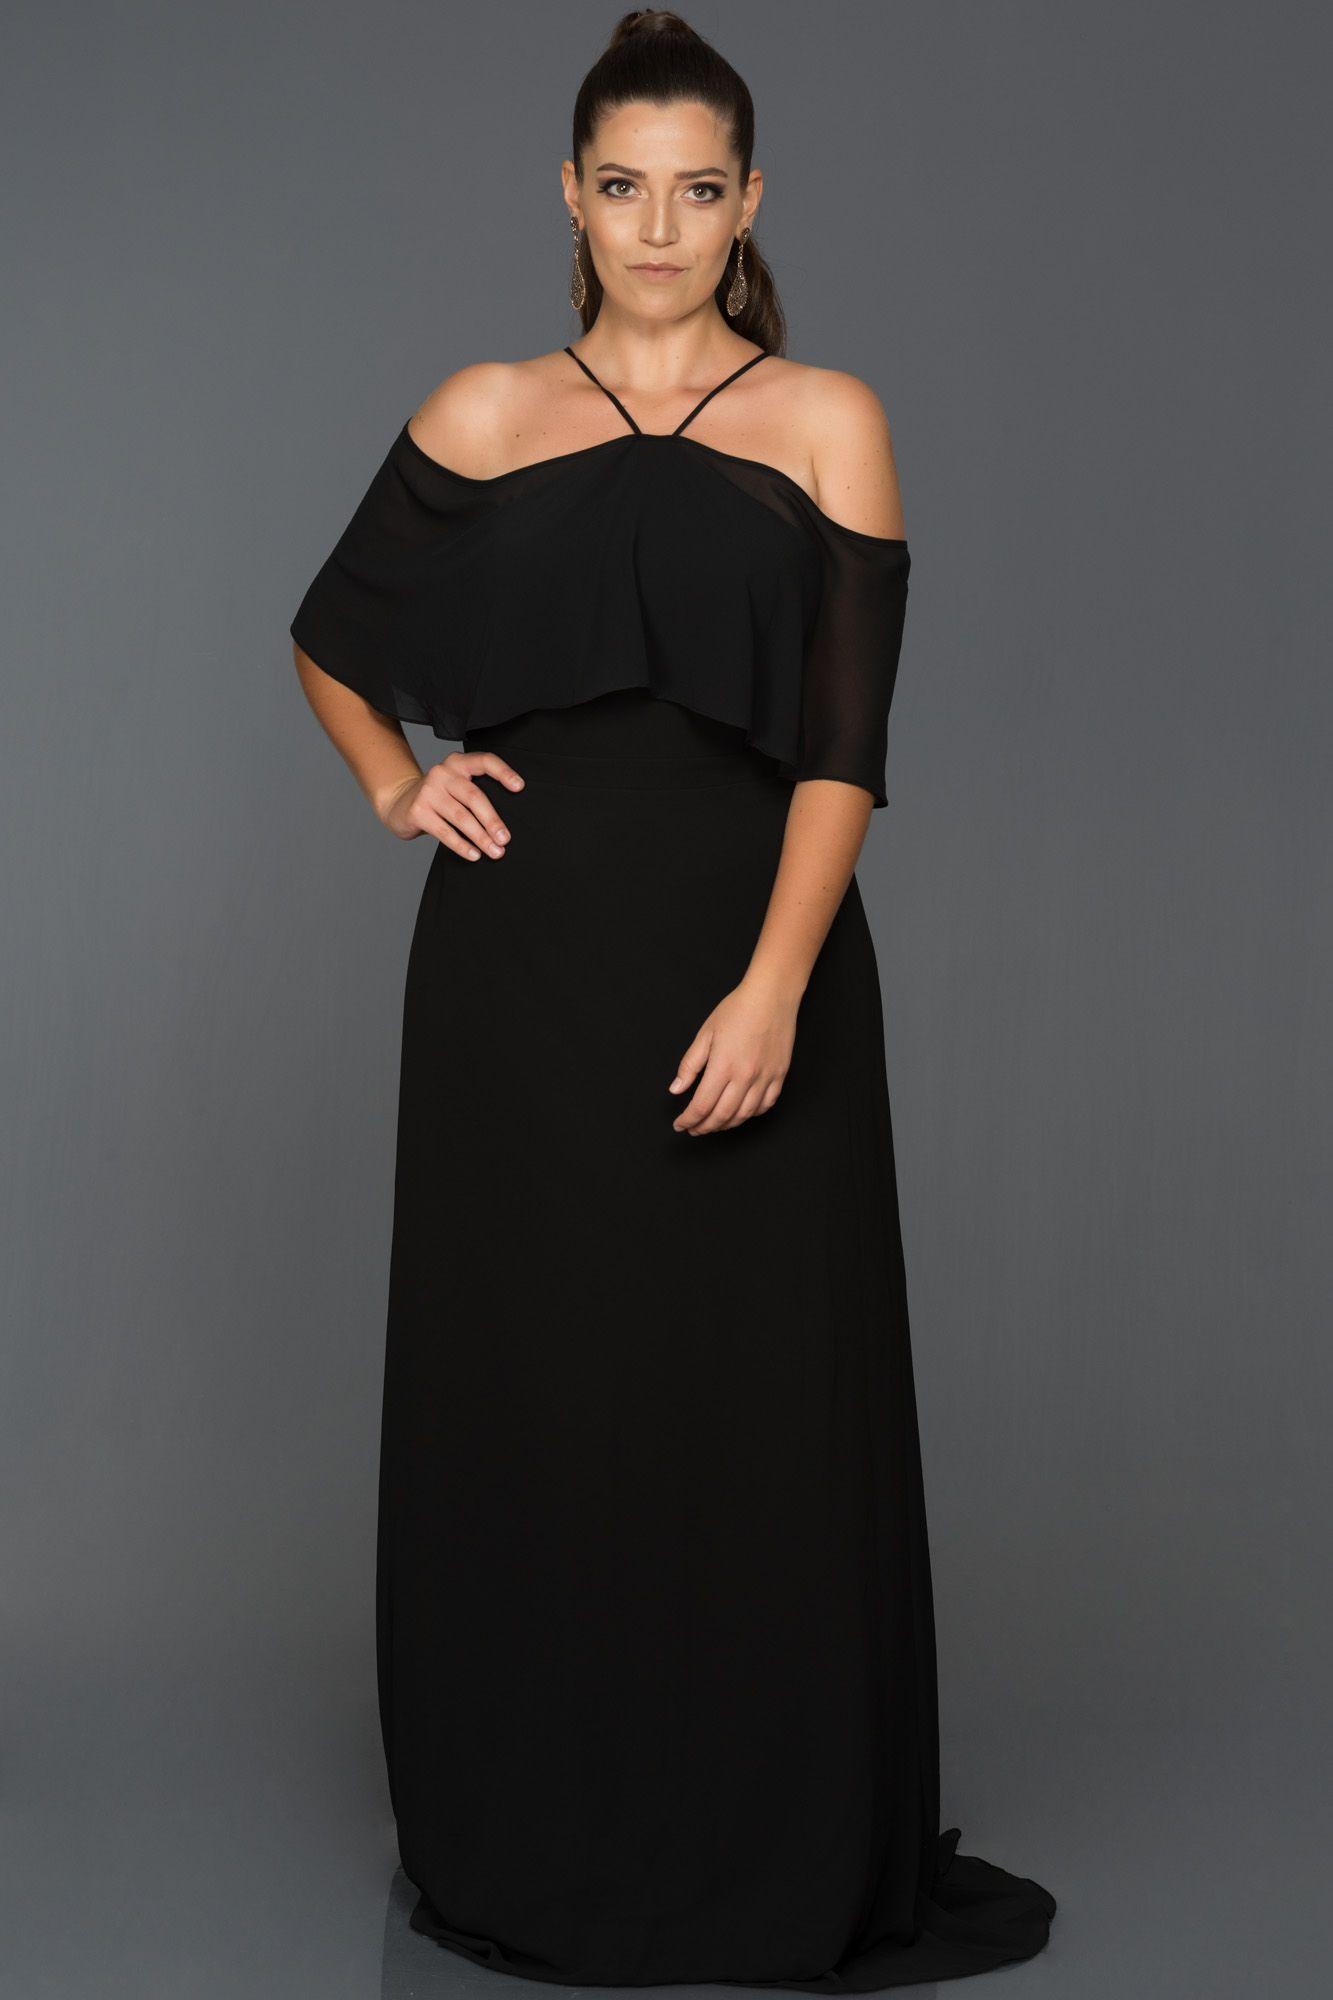 Siyah Sifon Buyuk Beden Abiye Elbise Abu470 Elbise Elbise Modelleri The Dress